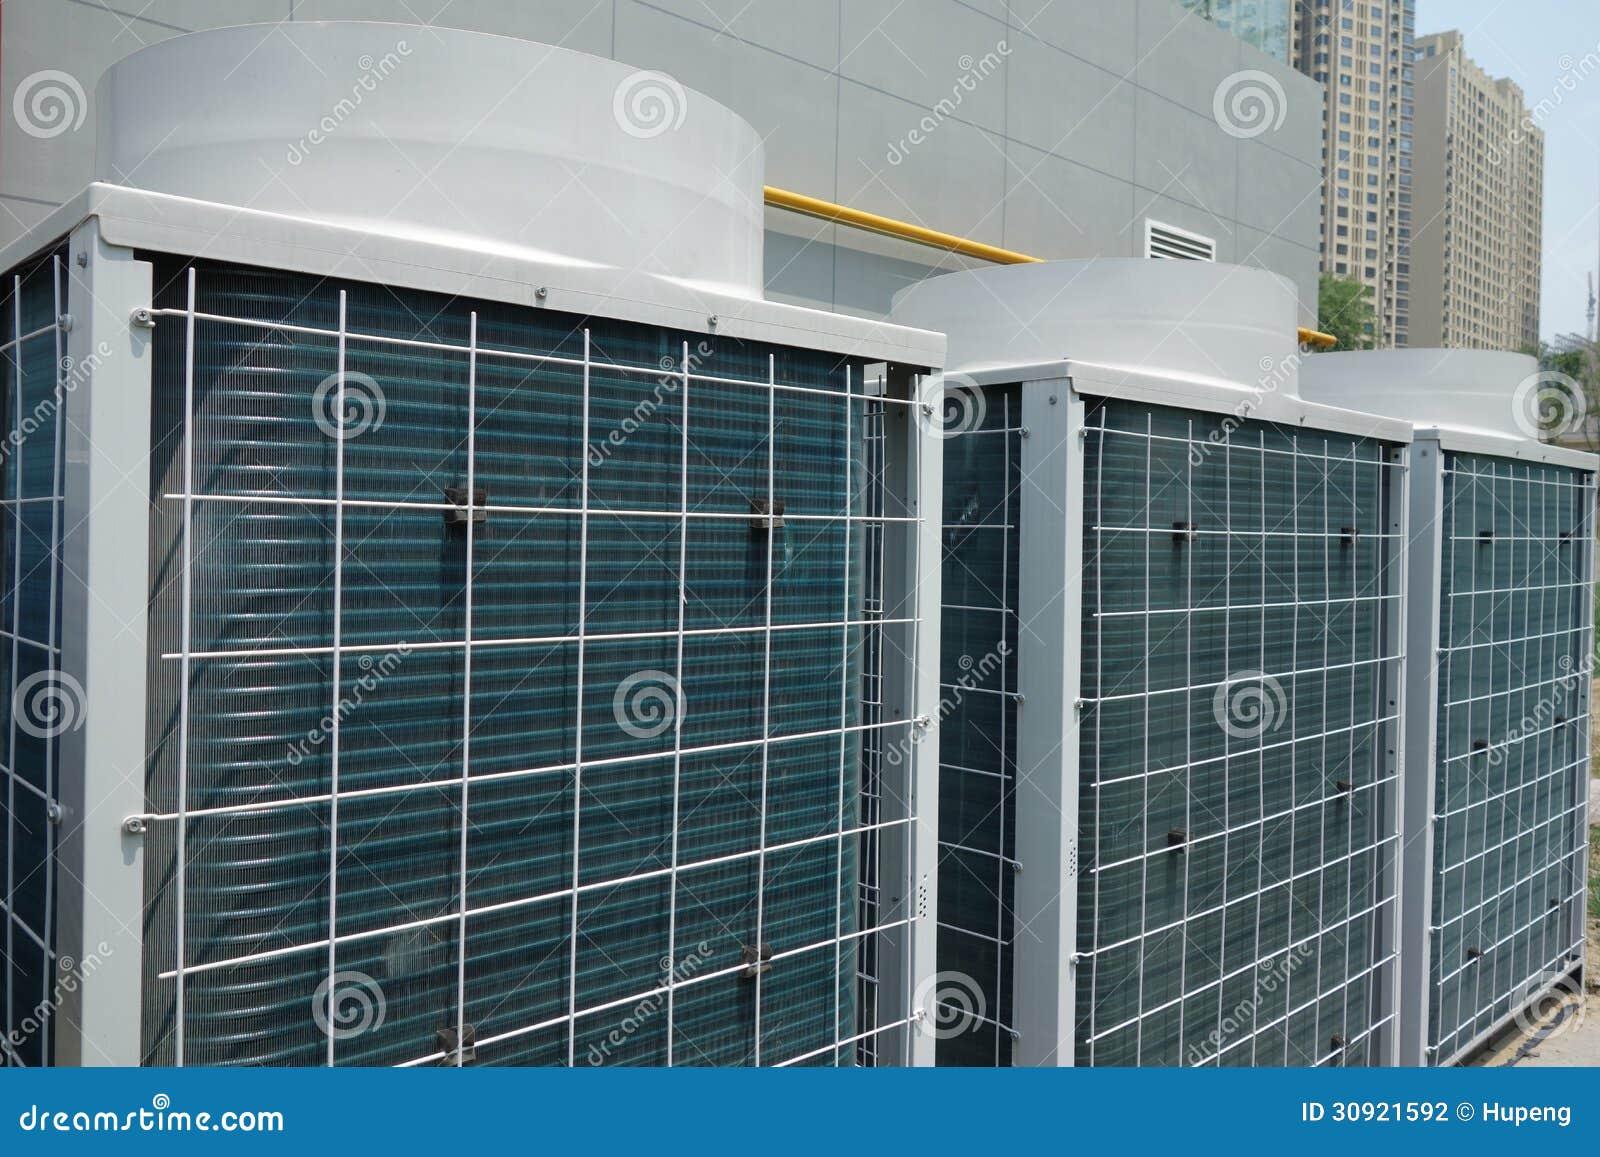 Air Conditioner Condenser Units : Air conditioner unit stock photography image